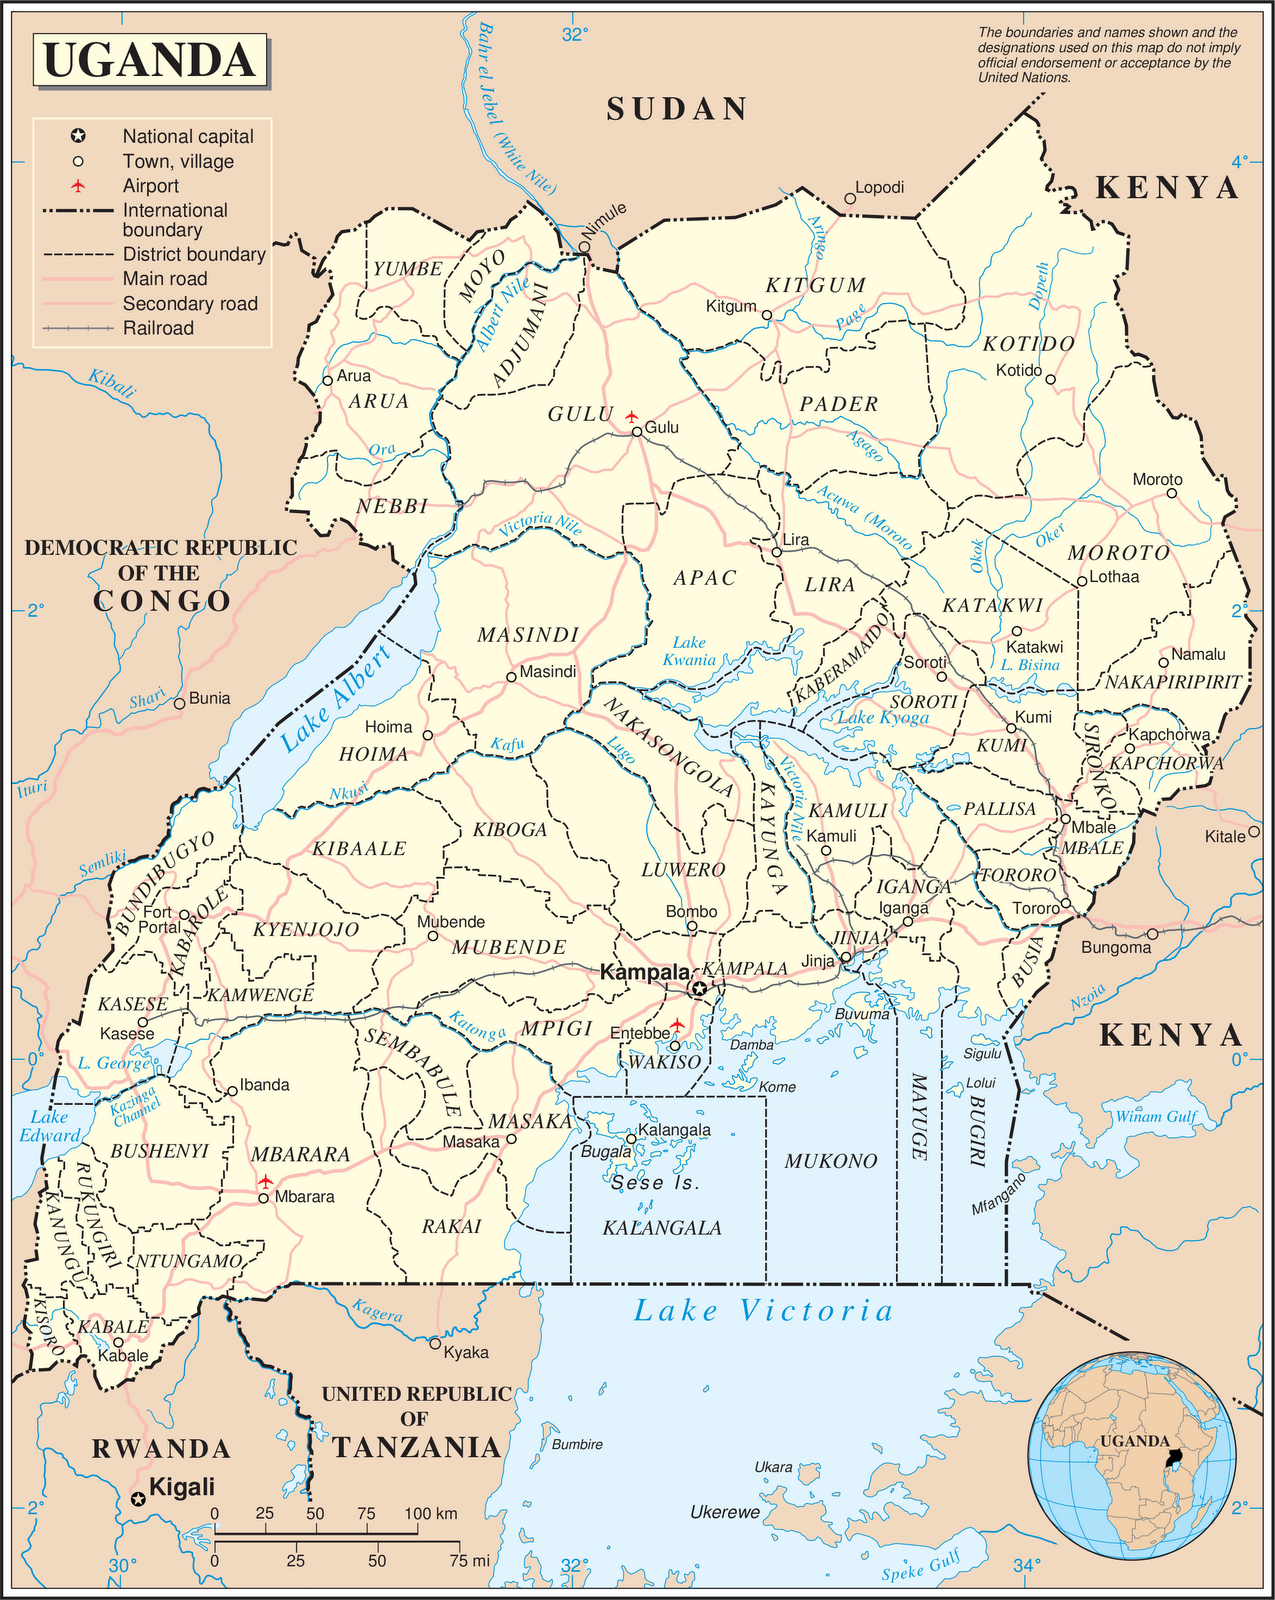 landen in afrika